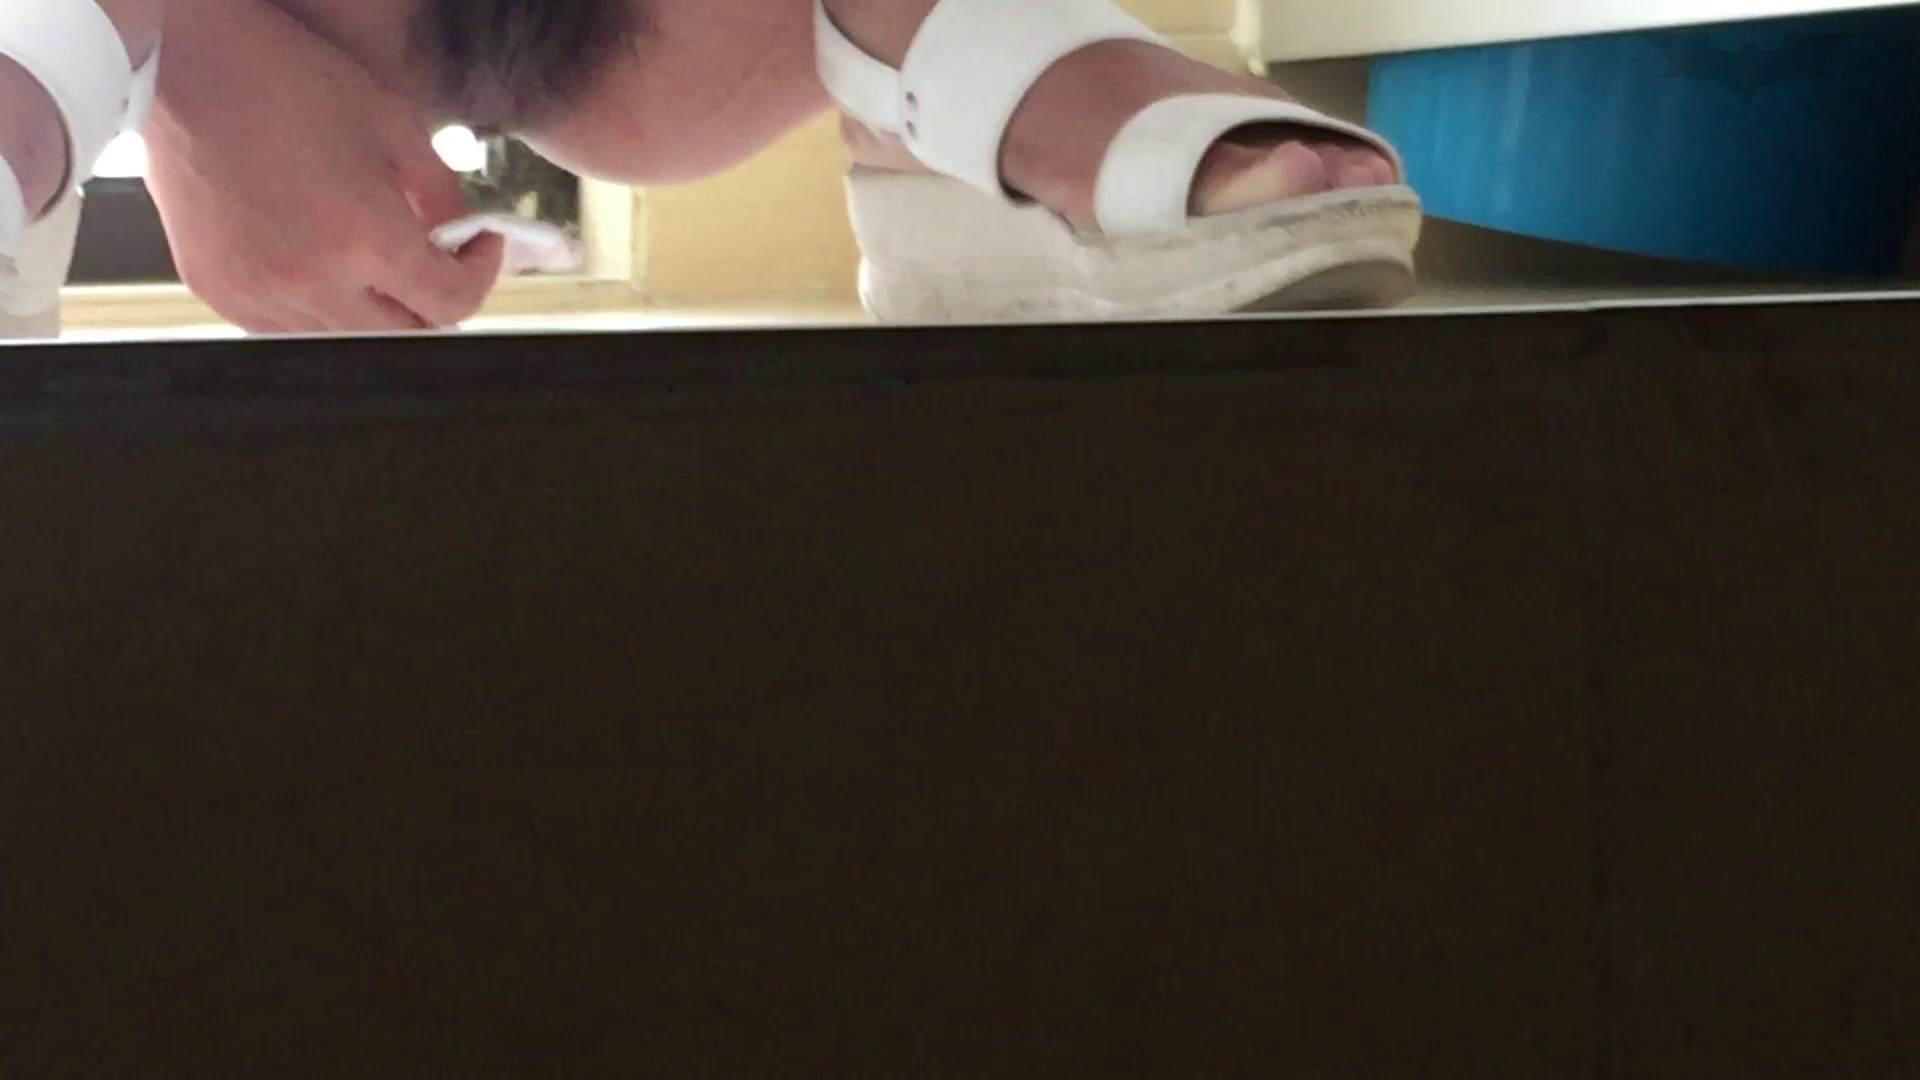 JD盗撮 美女の洗面所の秘密 Vol.66 洗面所のぞき AV無料動画キャプチャ 110枚 93